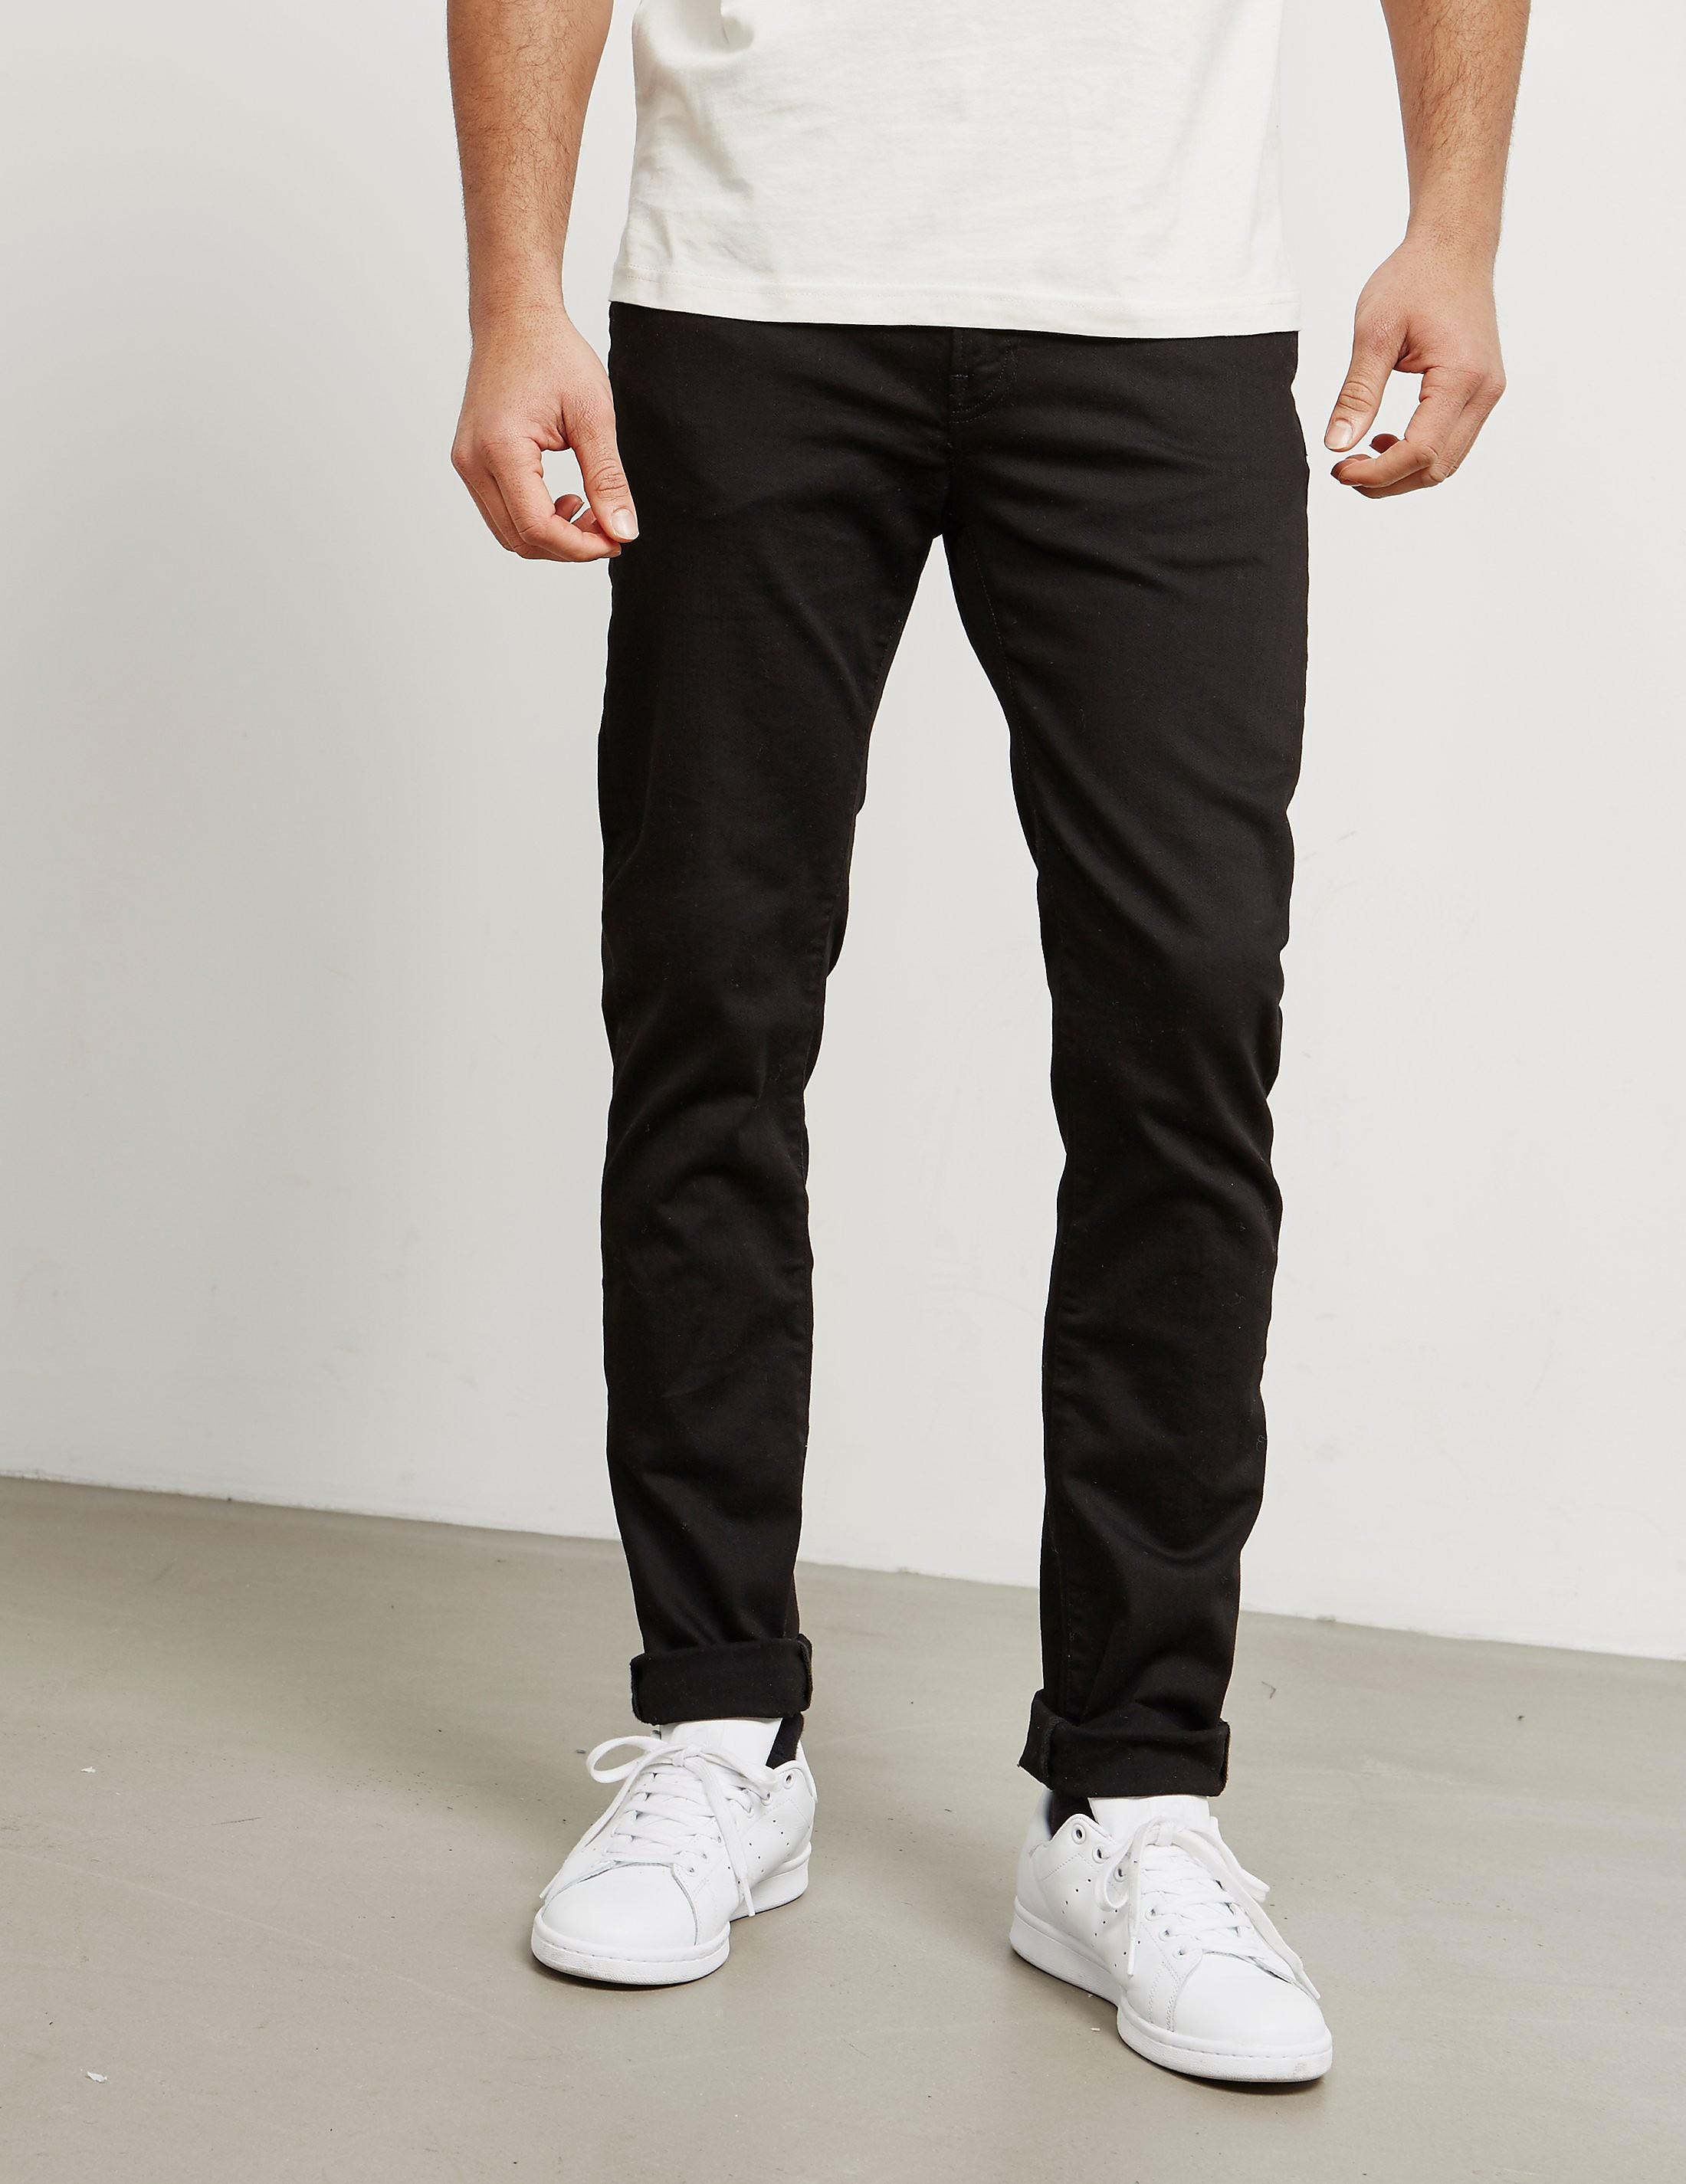 Paul Smith Slim Lightweight Stretch Jeans